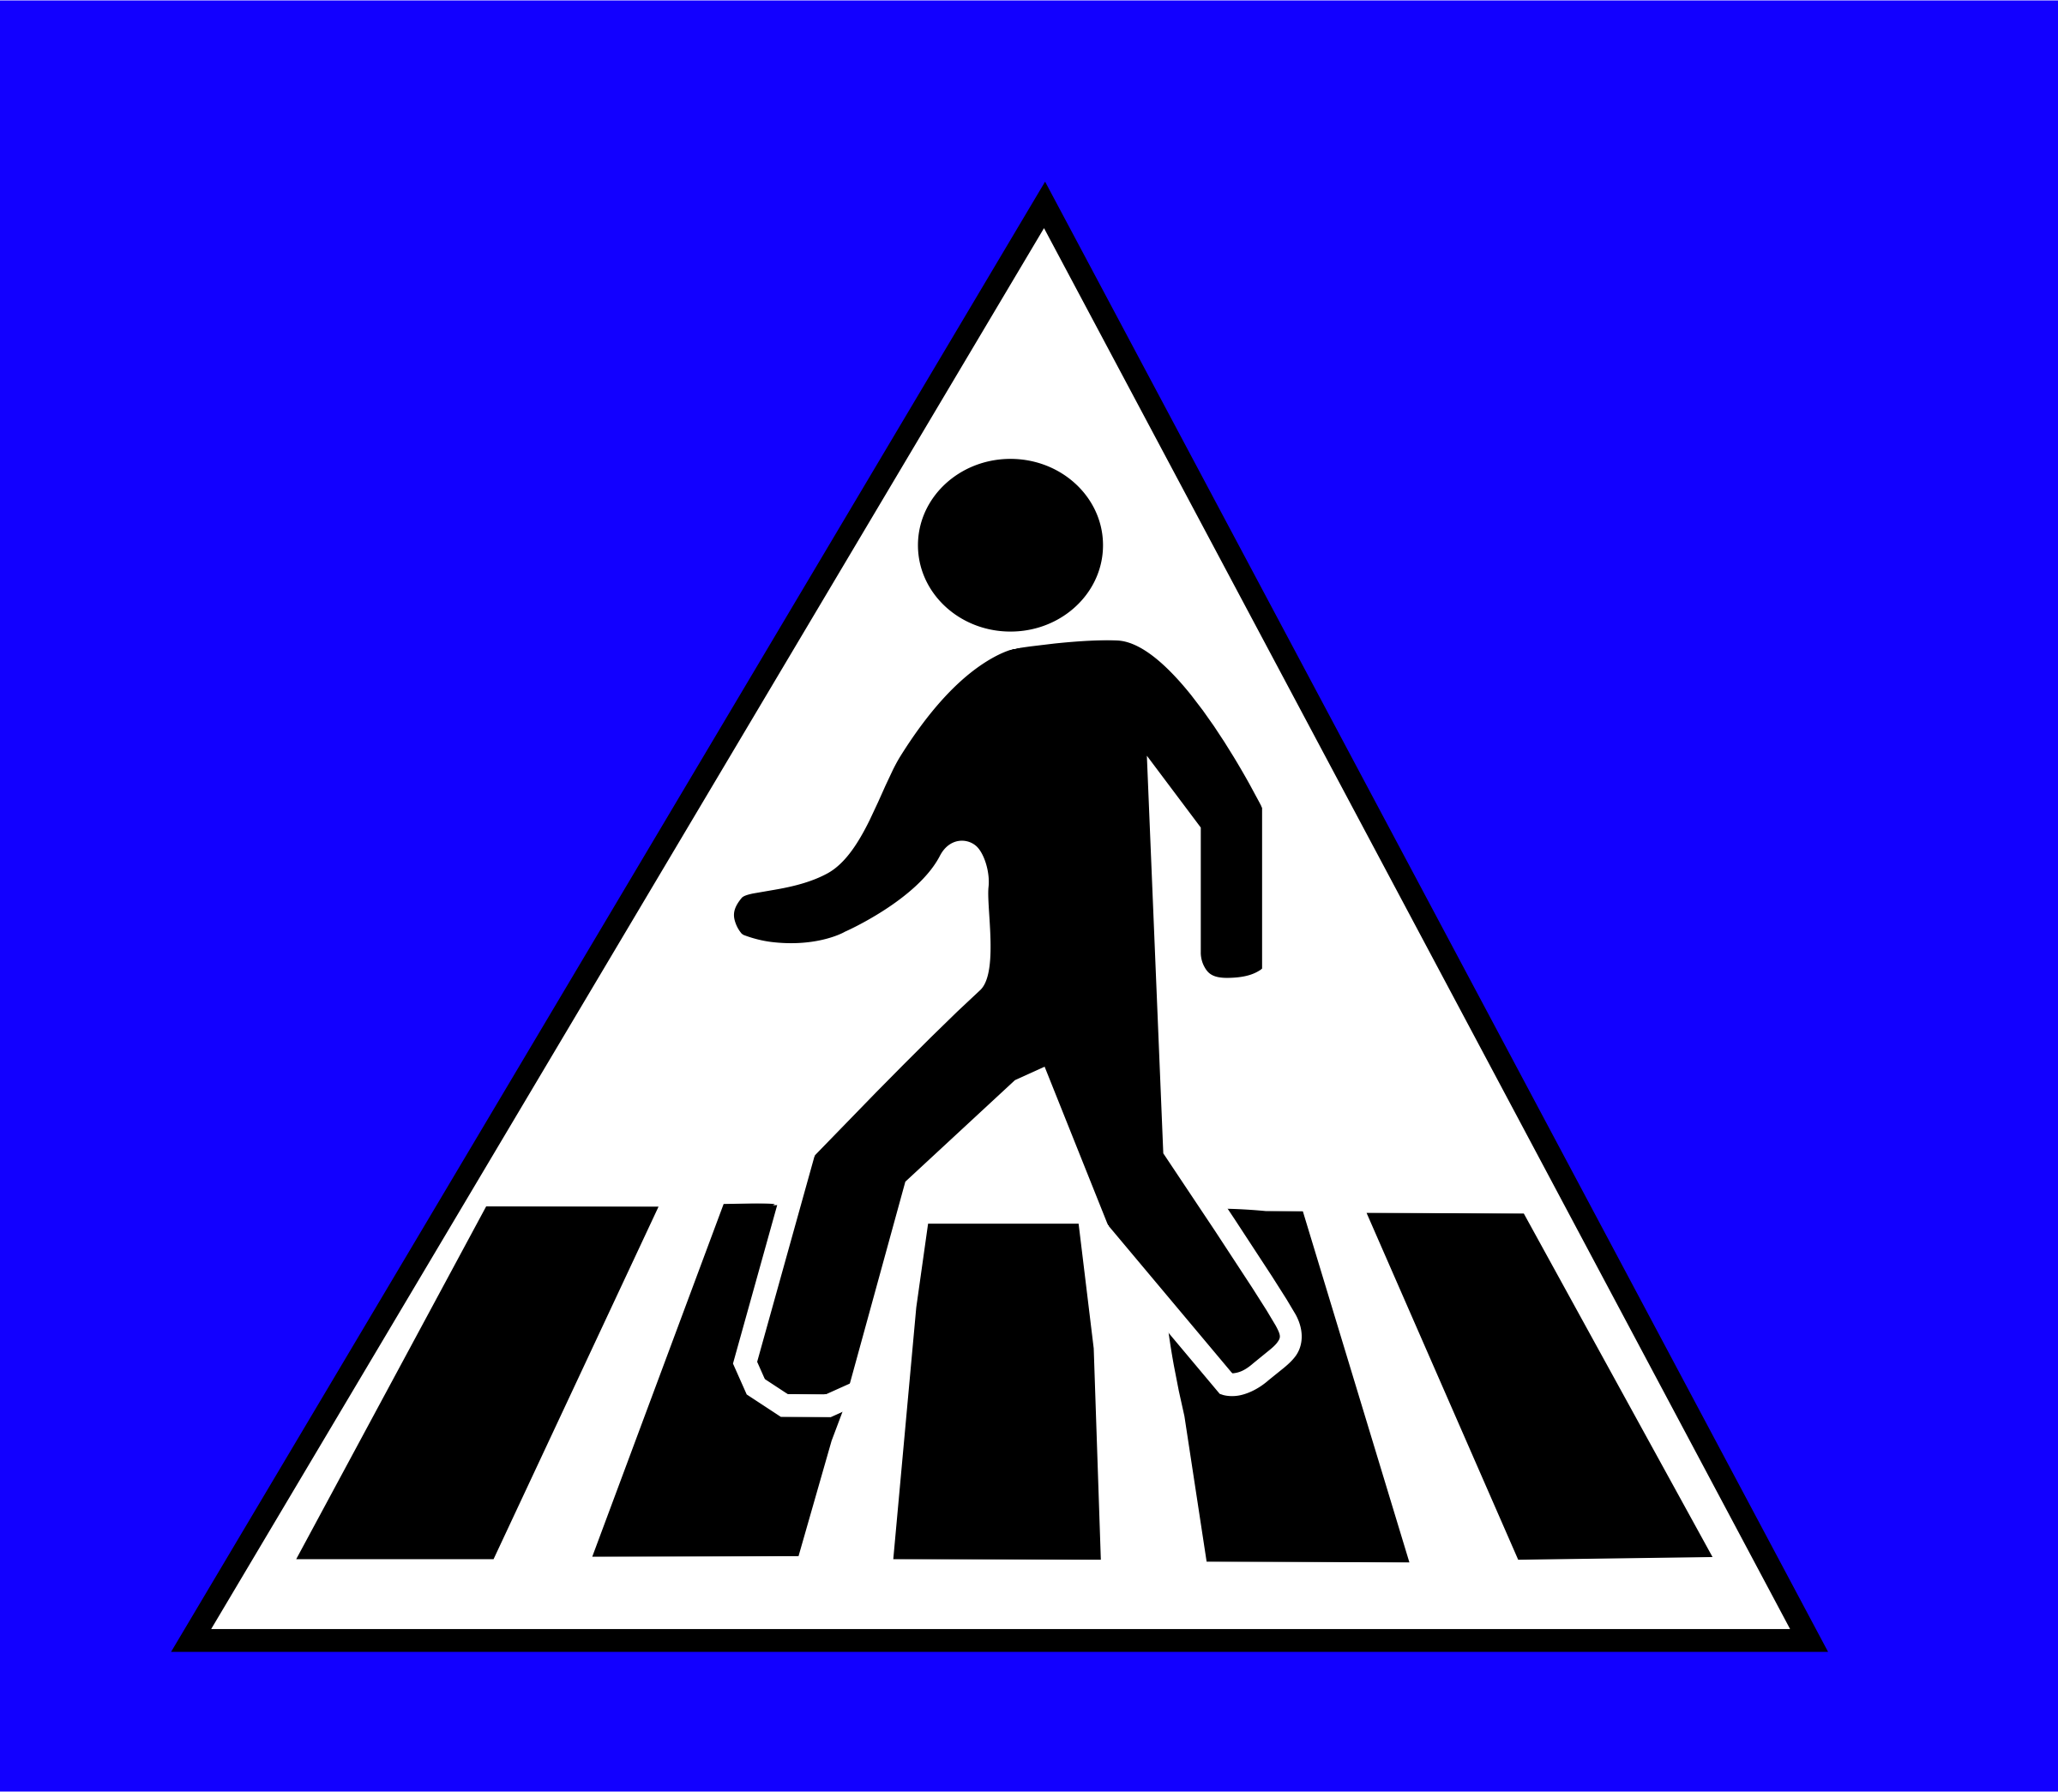 Traffic clipart cross street Crossing Sign Sign Traffic Crossing